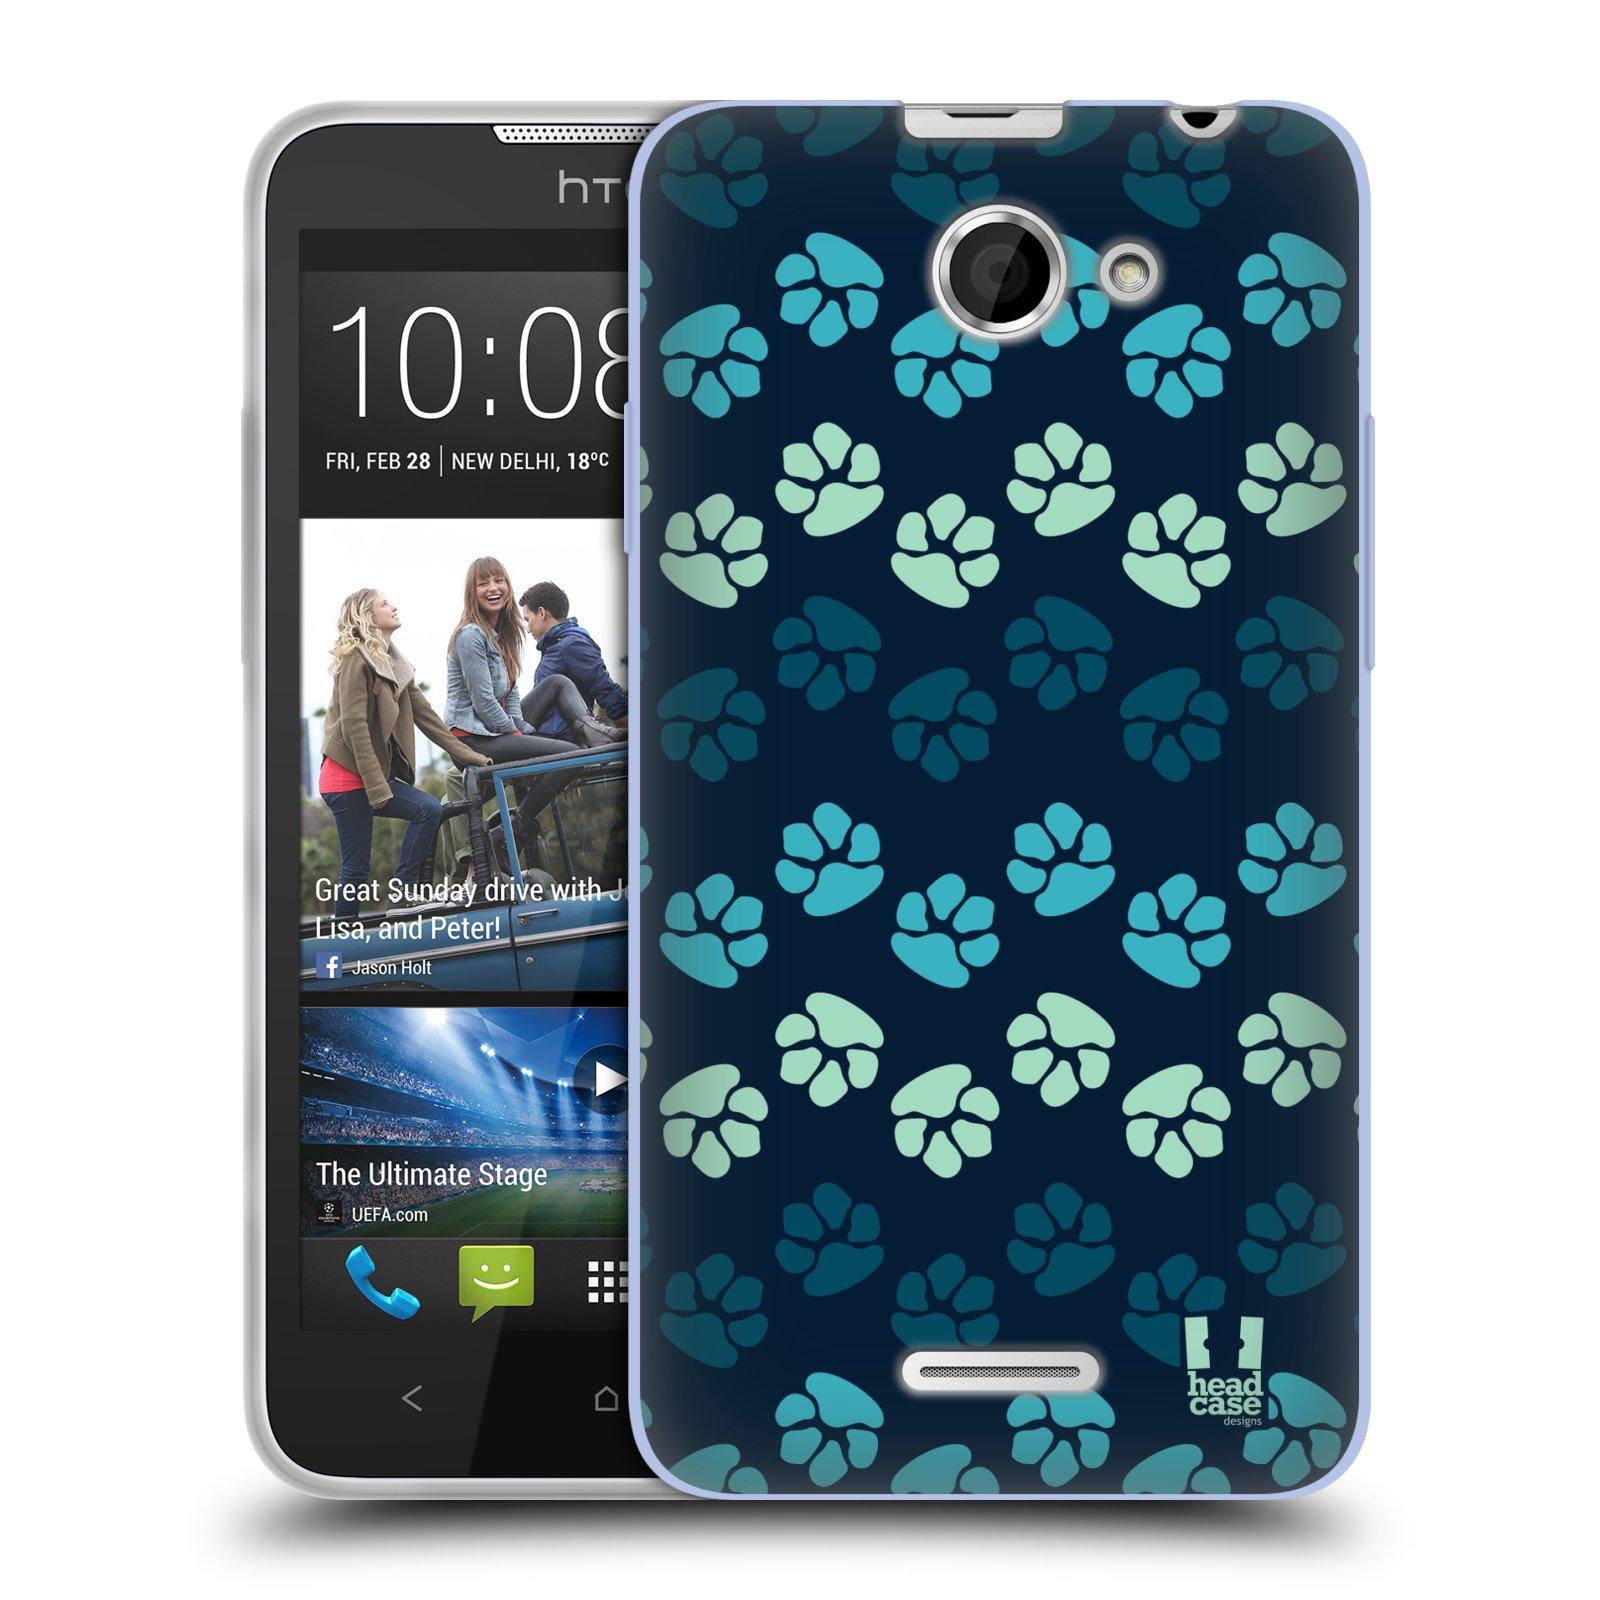 Silikonové pouzdro na mobil HTC Desire 516 HEAD CASE TLAPKY MODRÉ (Silikonový kryt či obal na mobilní telefon HTC Desire 516 Dual SIM)